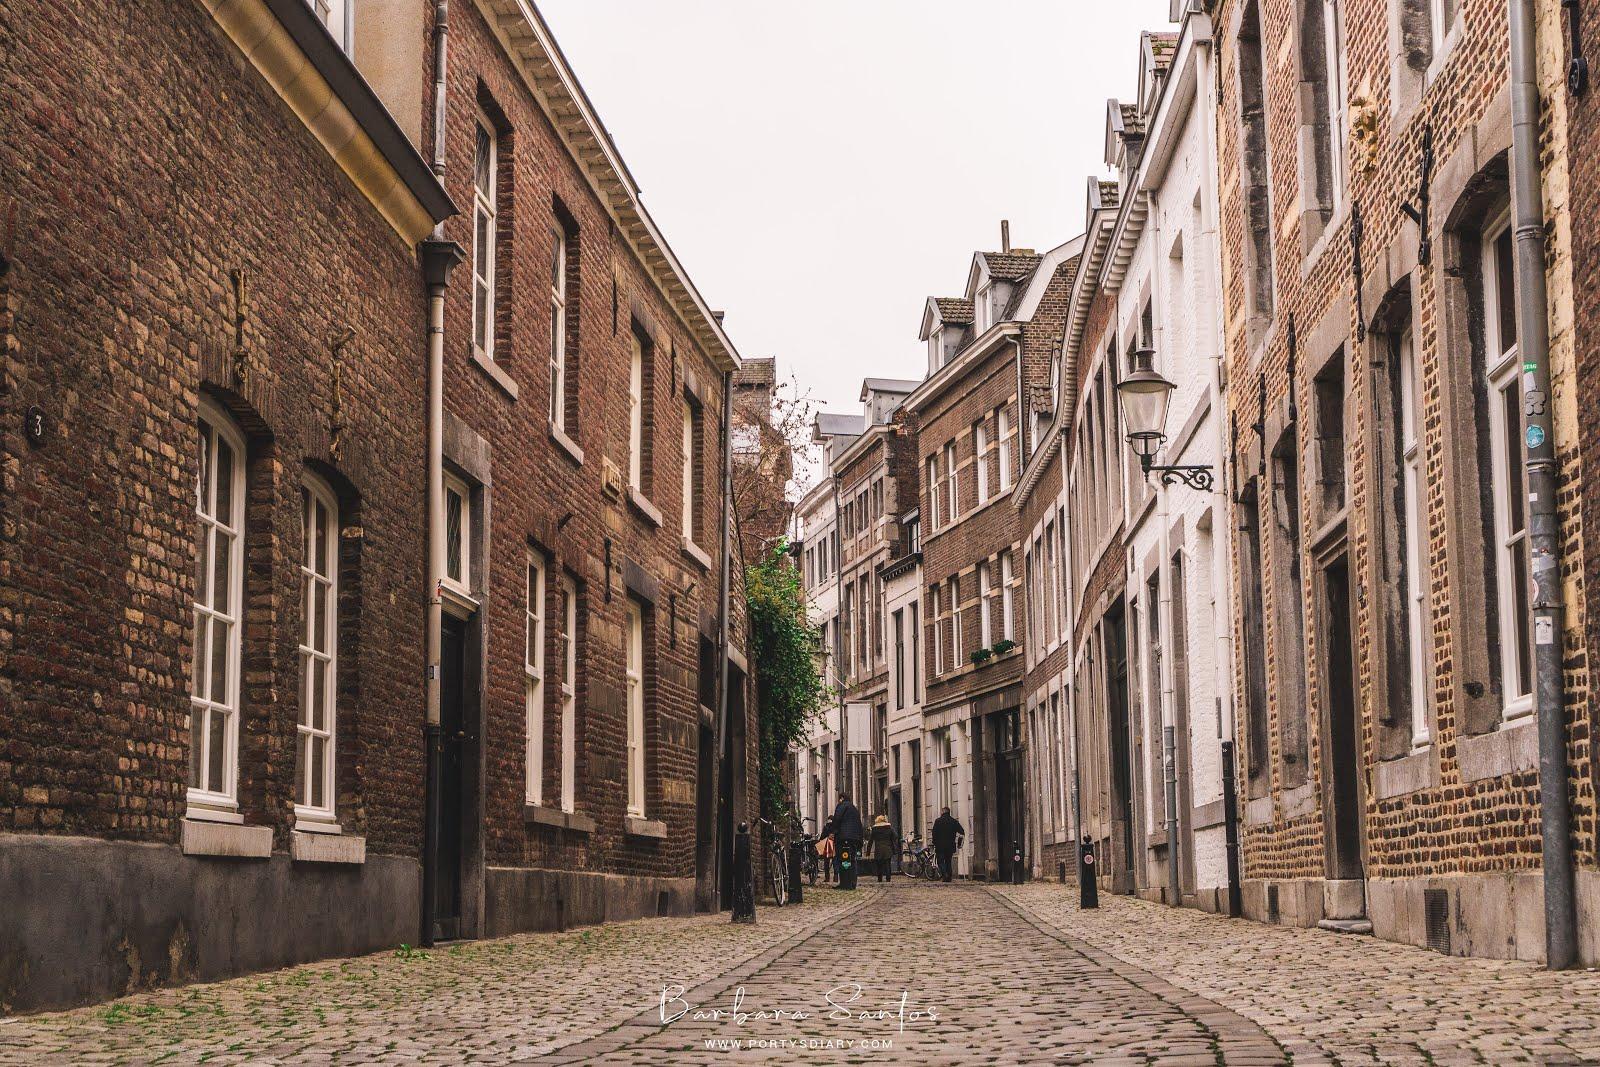 Taffelstraat - Maastricht - NL - Travel.